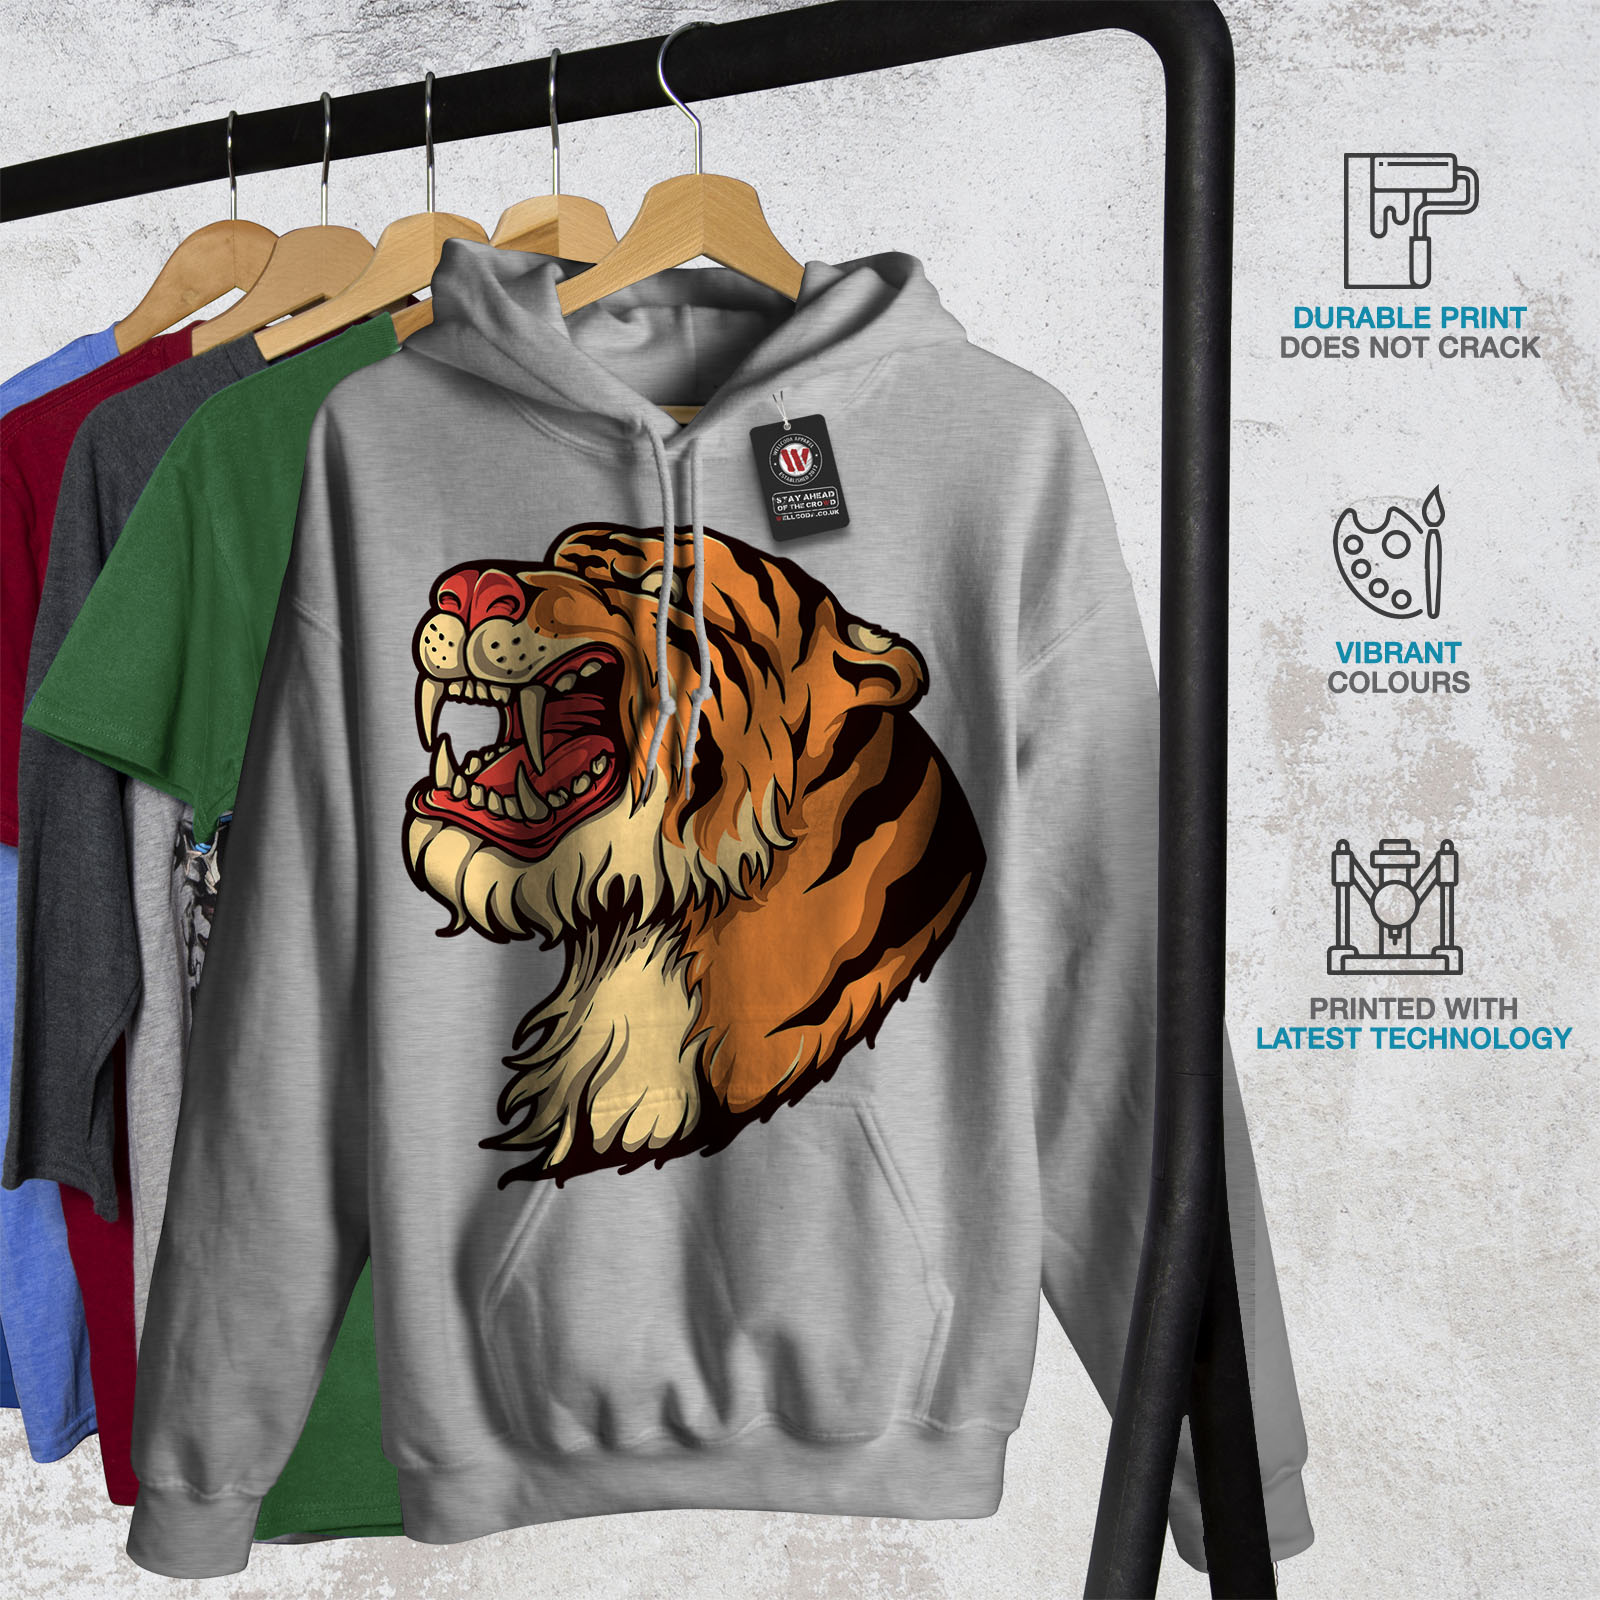 Wellcoda-New-Mens-Hoodie-Cartoon-Animal-Casual-Hooded-Sweatshirt